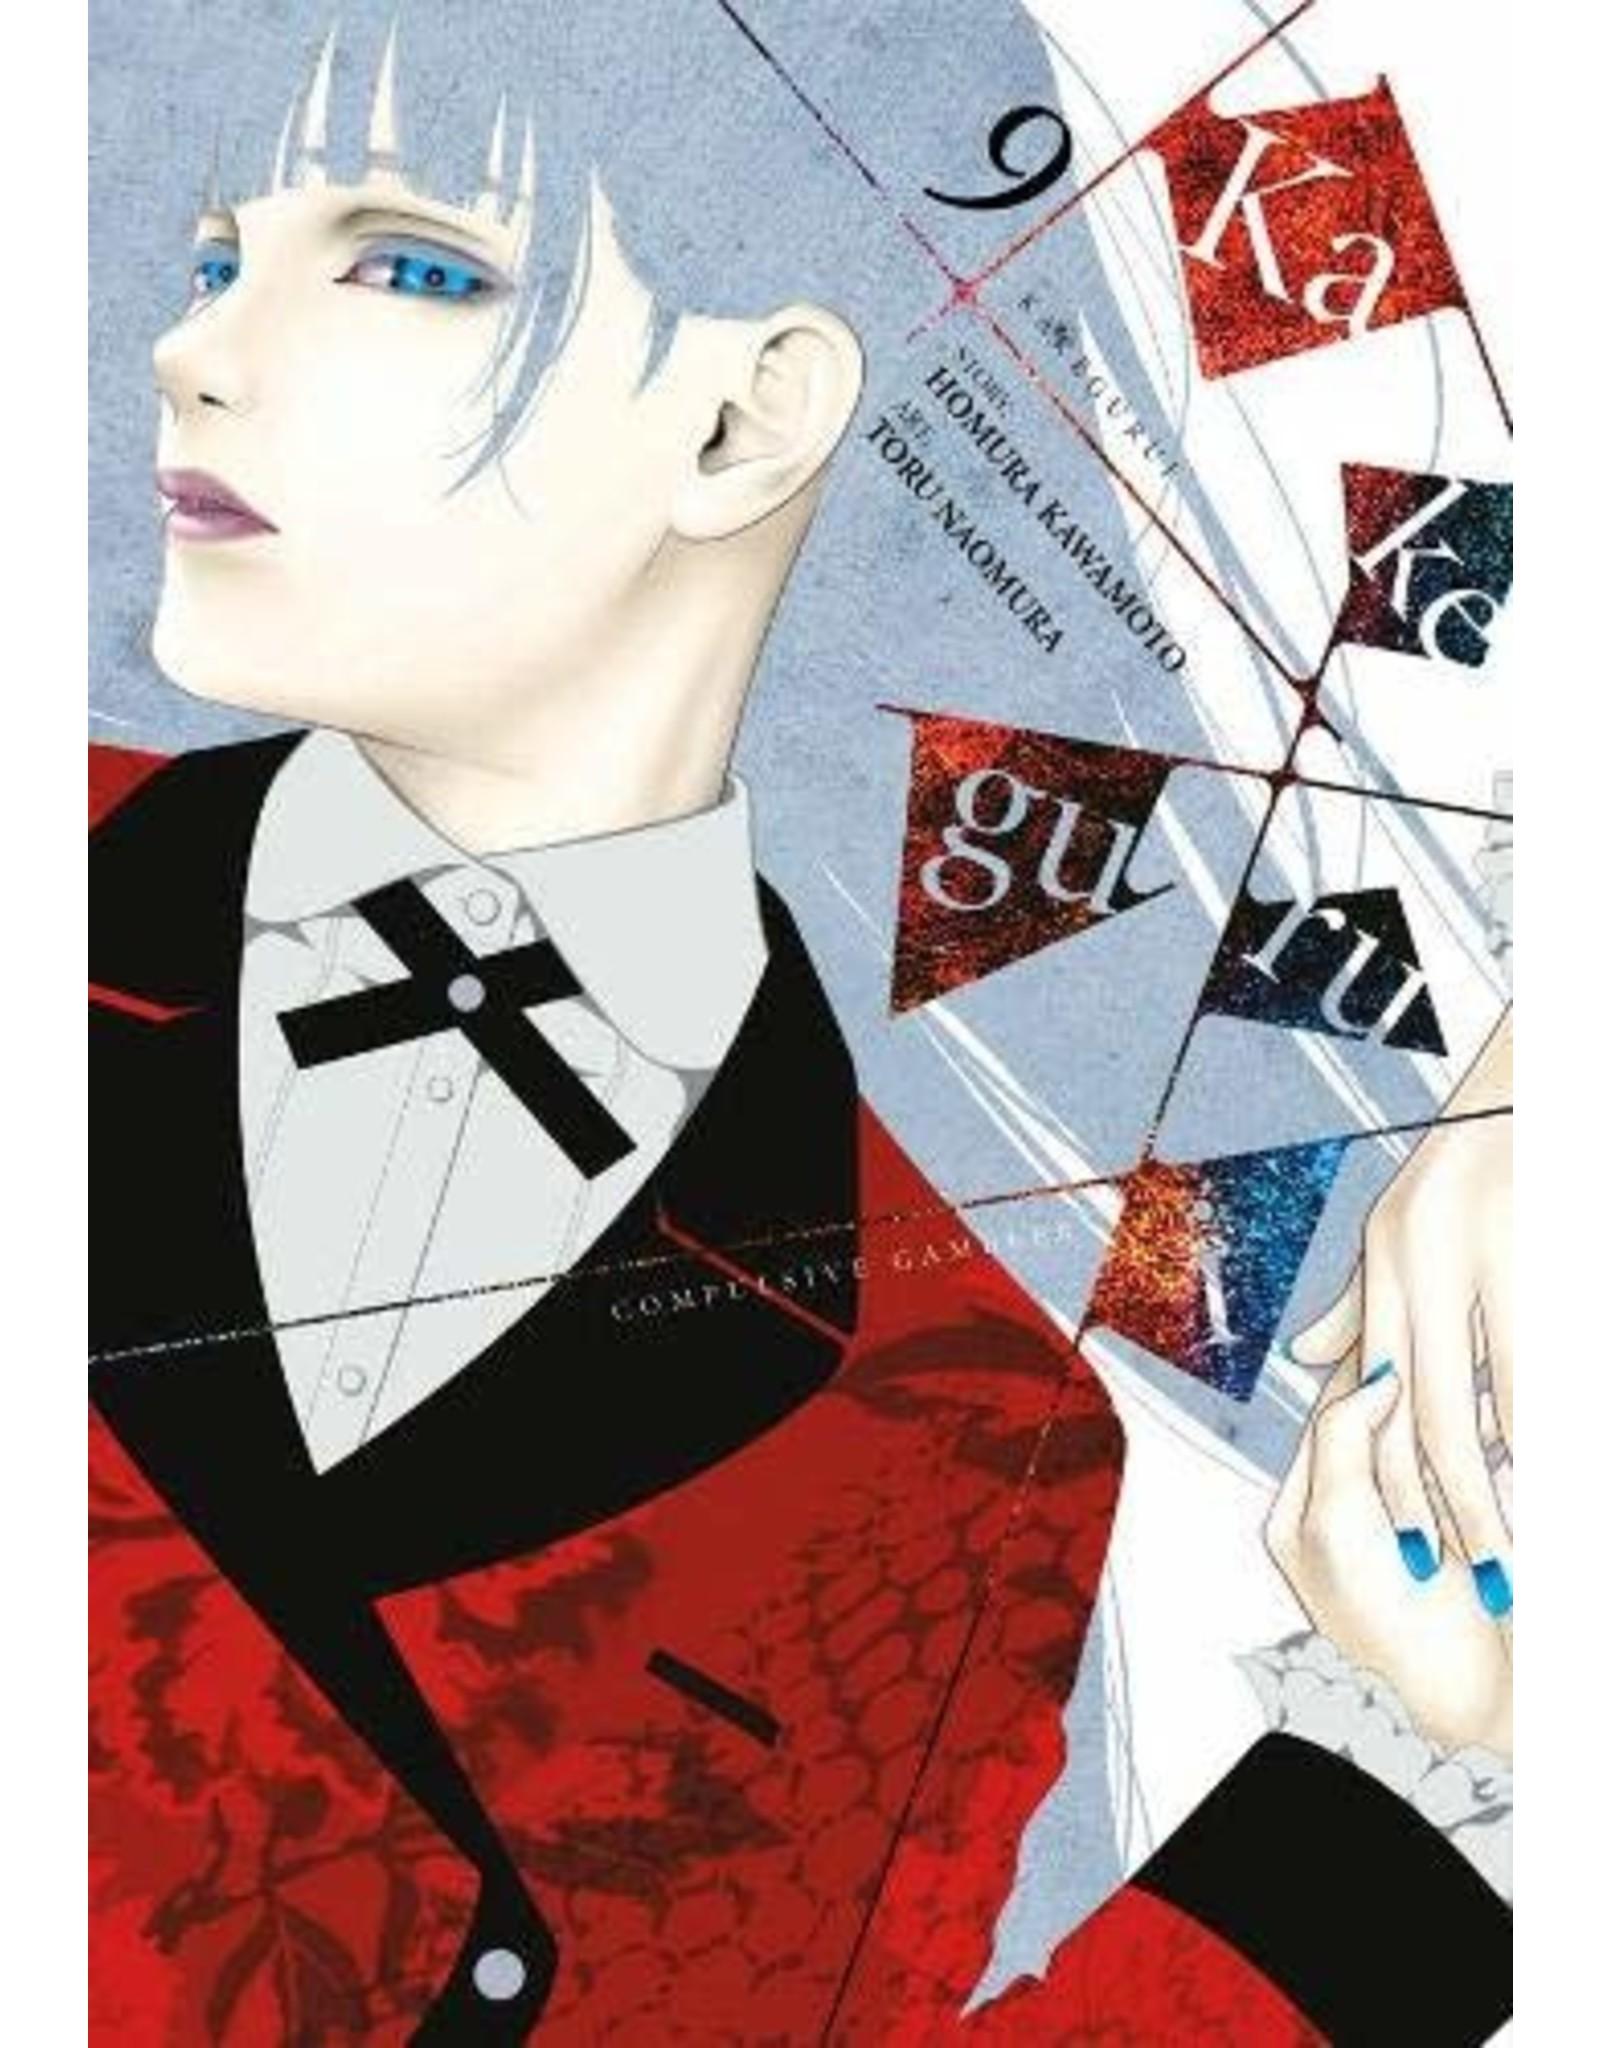 Kakegurui: Compulsive Gambler 9 (English)